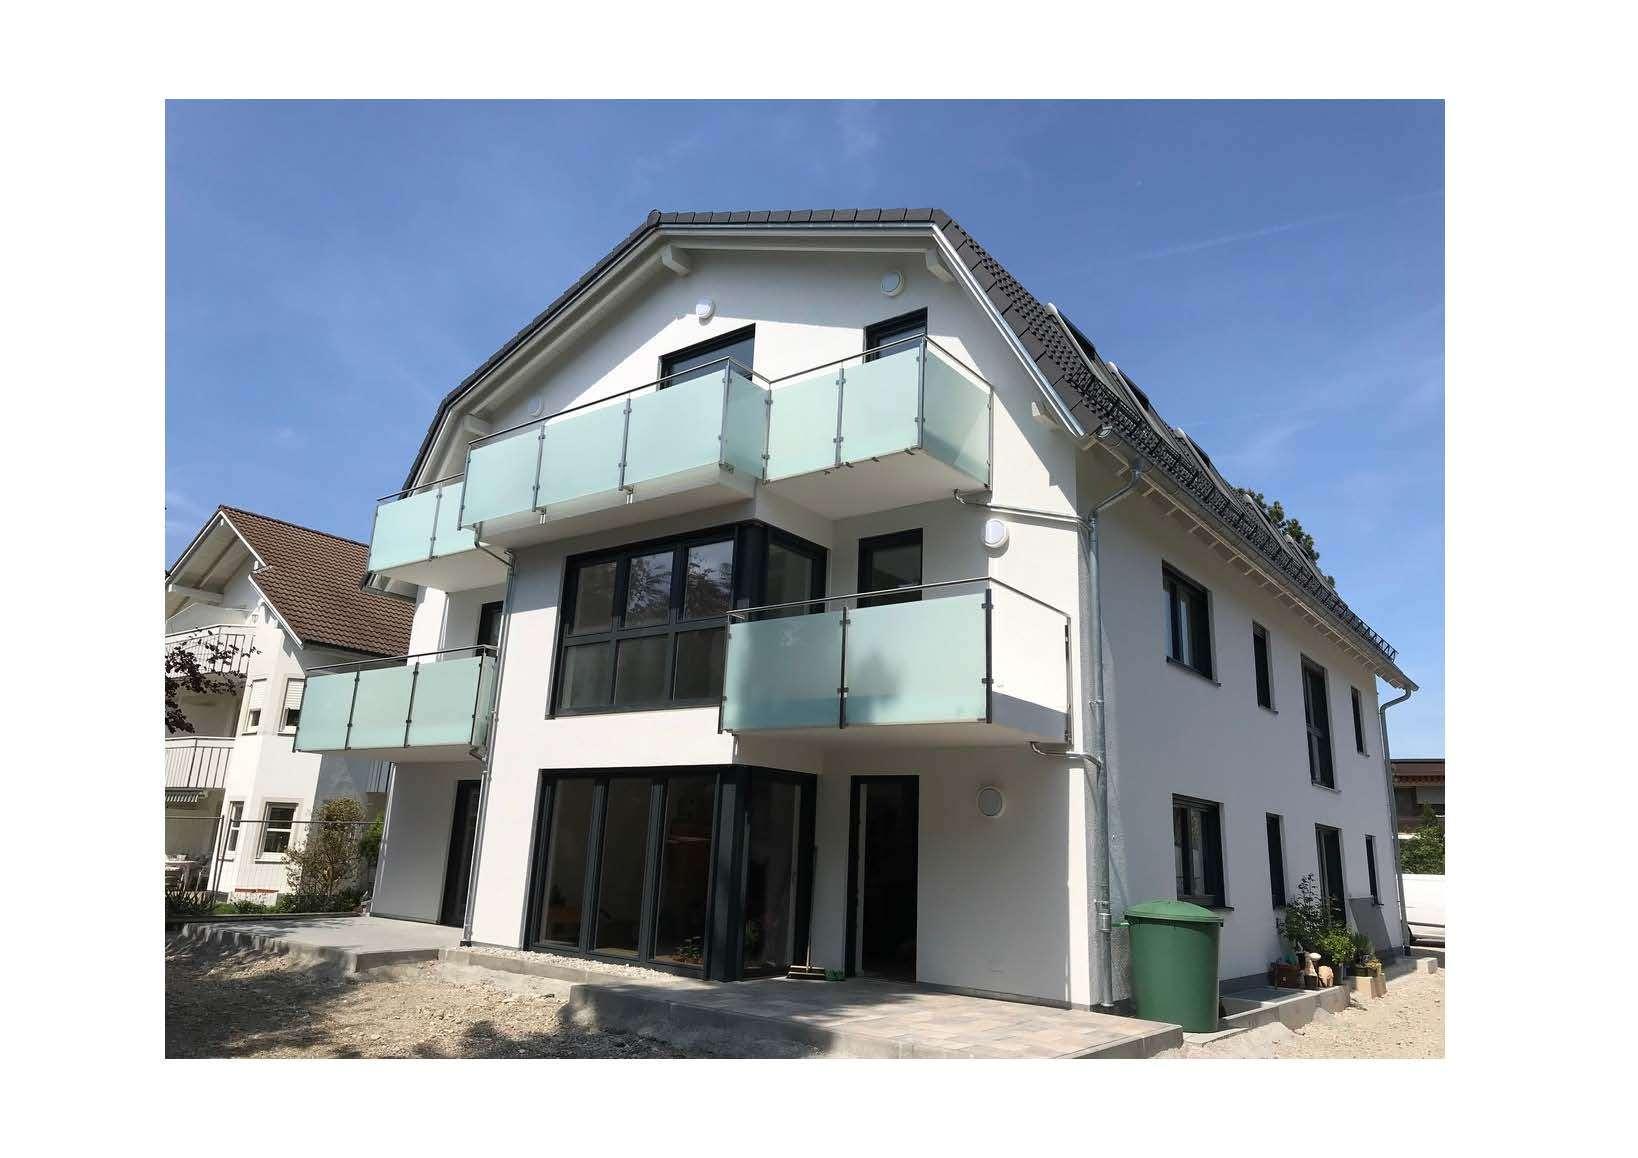 Helle 2-Zimmer-Dachgeschosswohnung mit Balkon